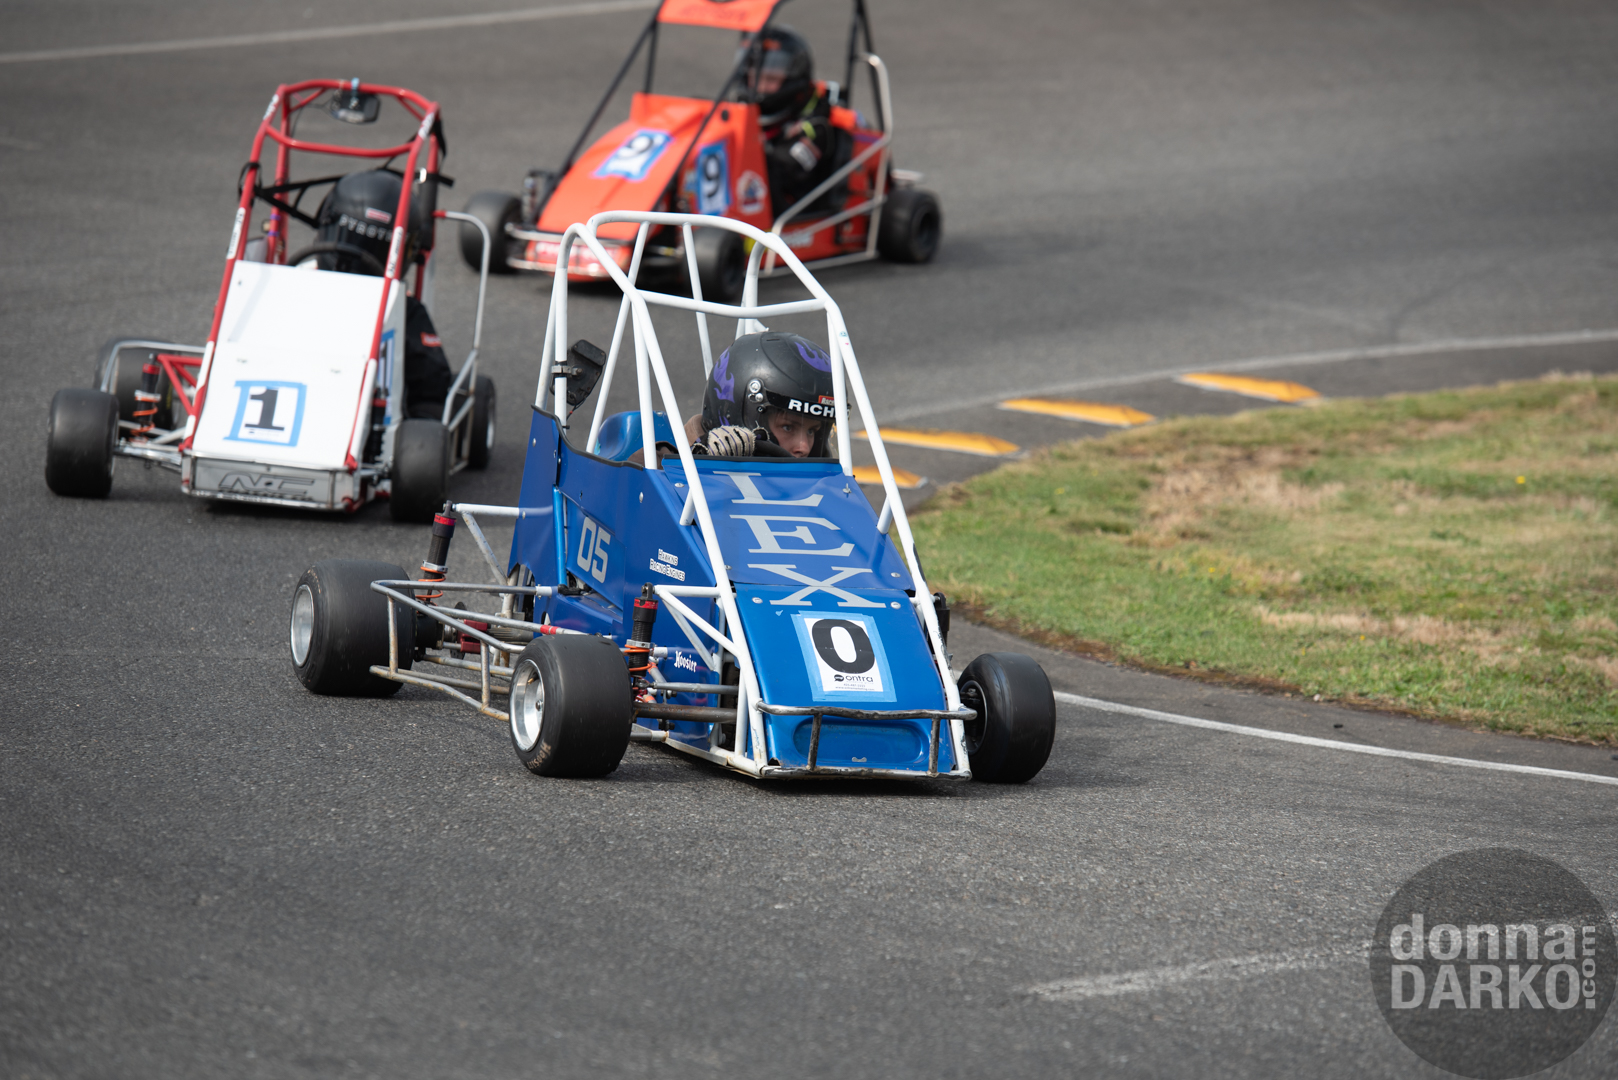 QWMA (Racing) 8-11-2019 DSC_7800.jpg